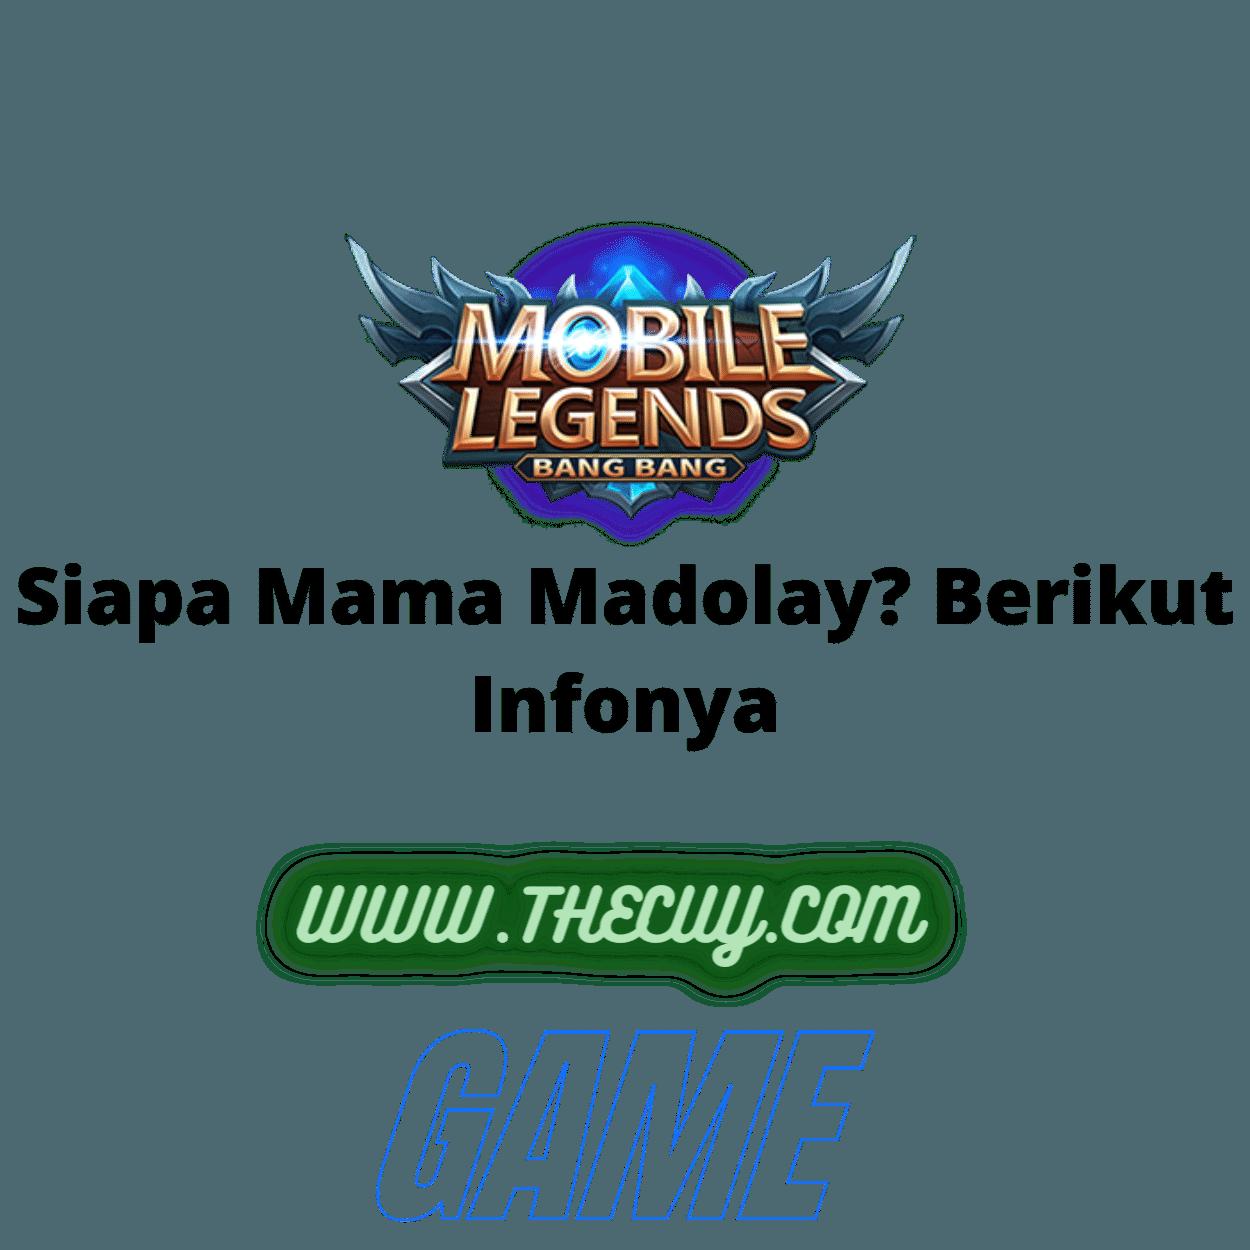 Siapa Mama Madolay? Berikut Infonya